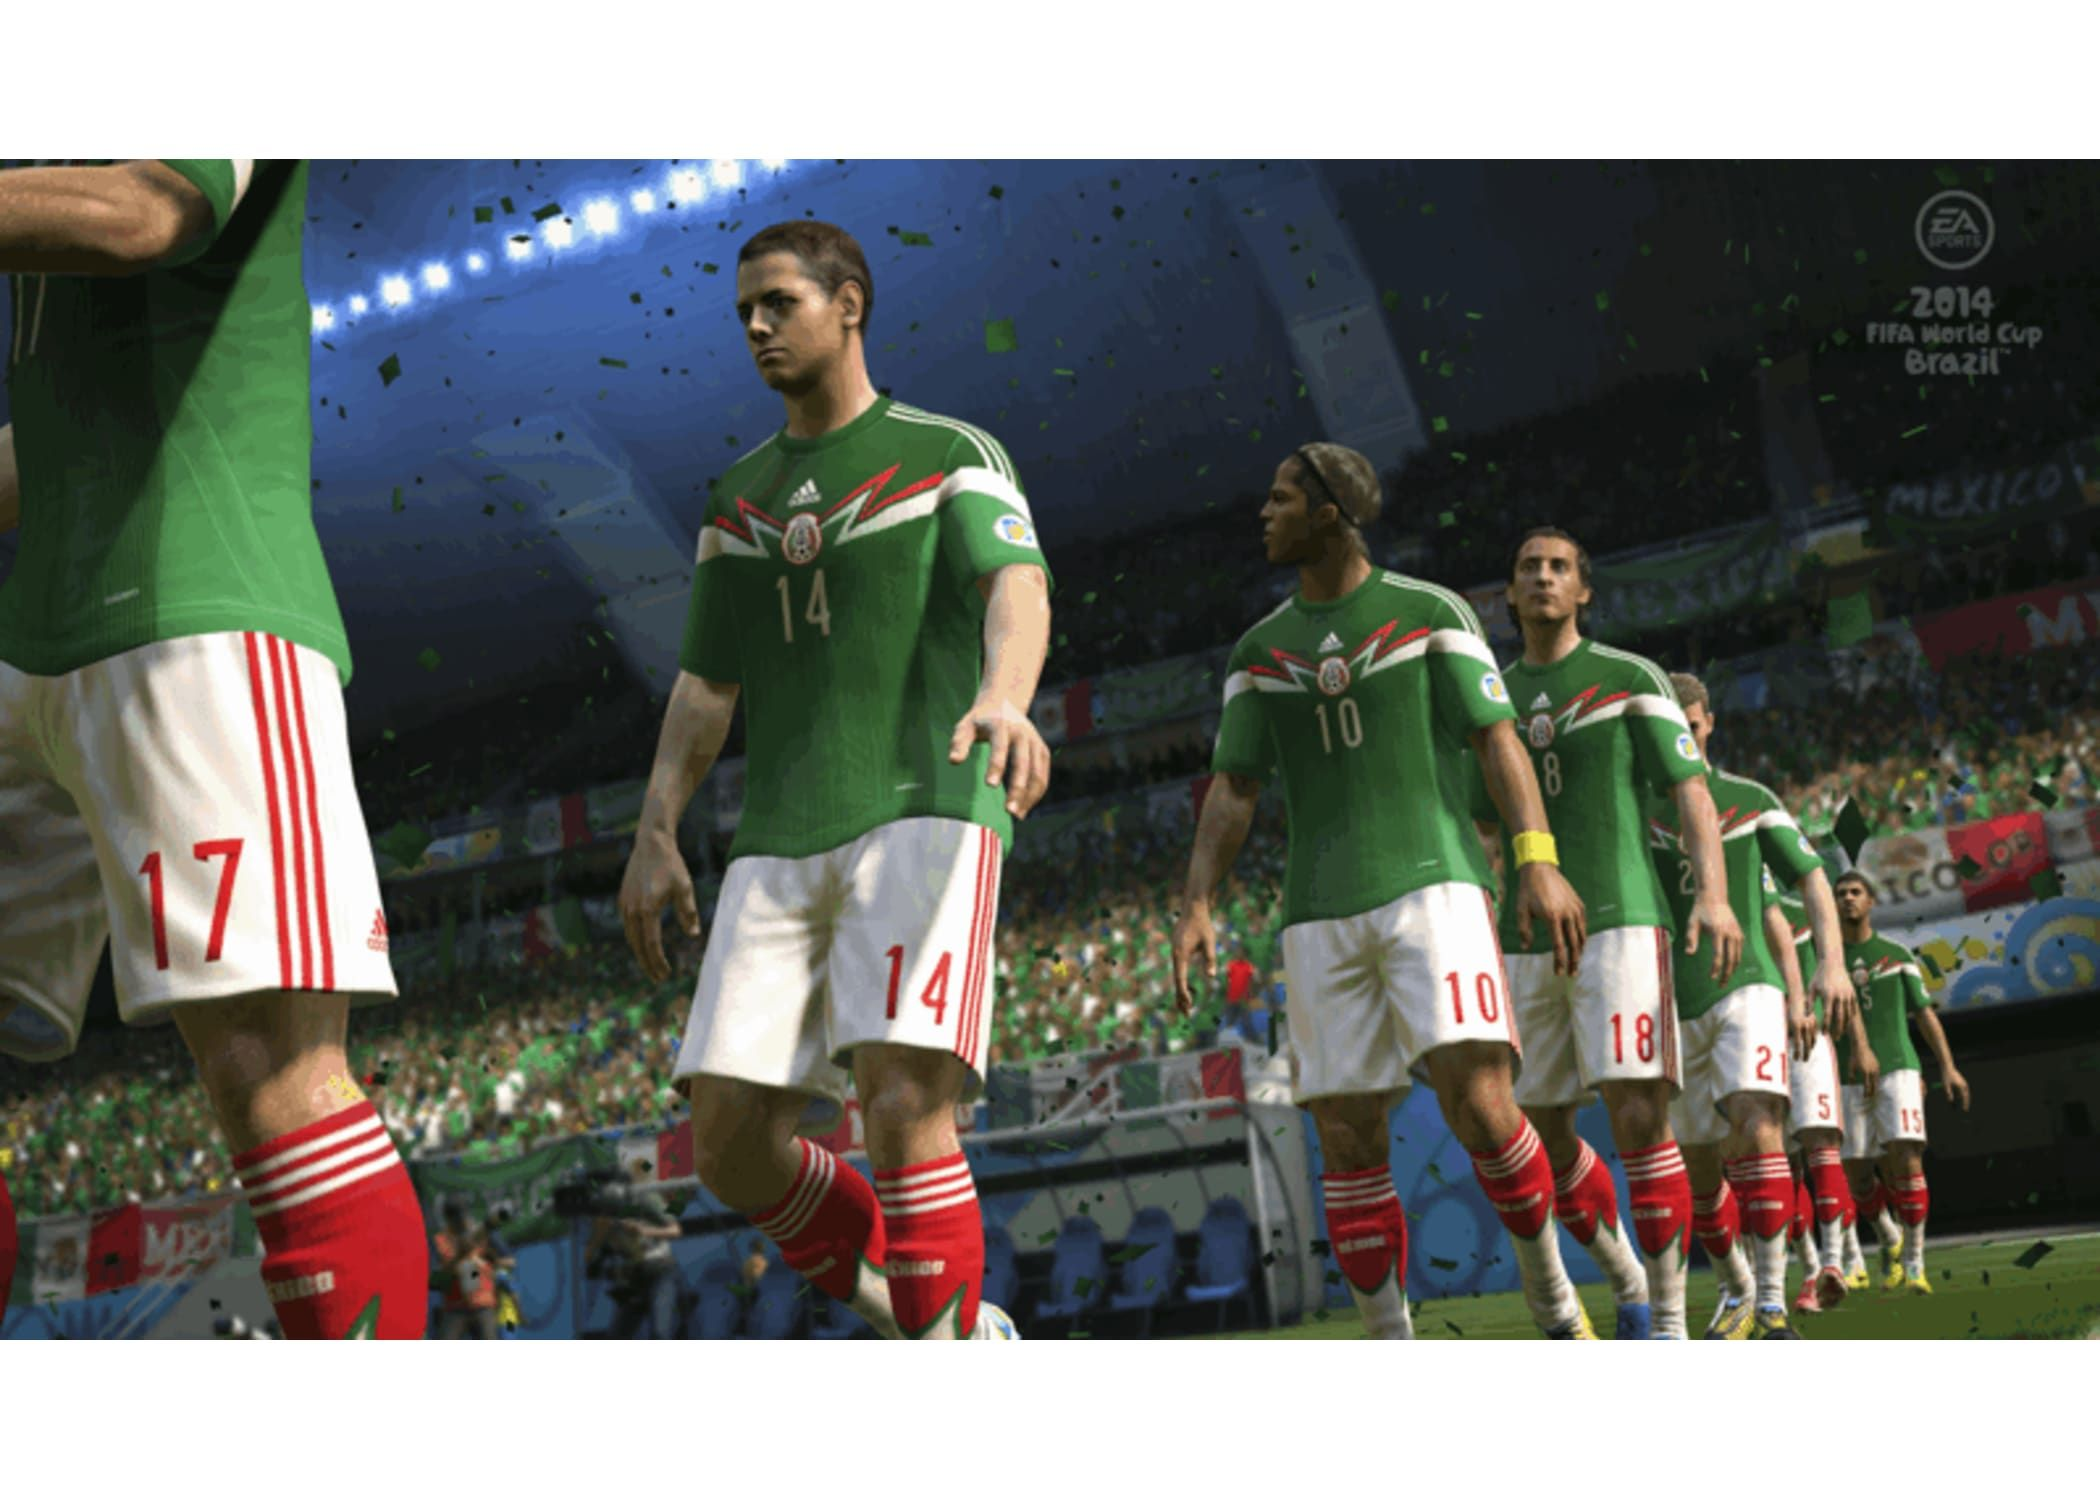 Buy Ea Sports 2014 Fifa World Cup Brazil On Xbox 360 Game Affiliate Sponsored Fifa Sports Buy Ea World In 2020 Fifa Fifa World Cup Ea Sports